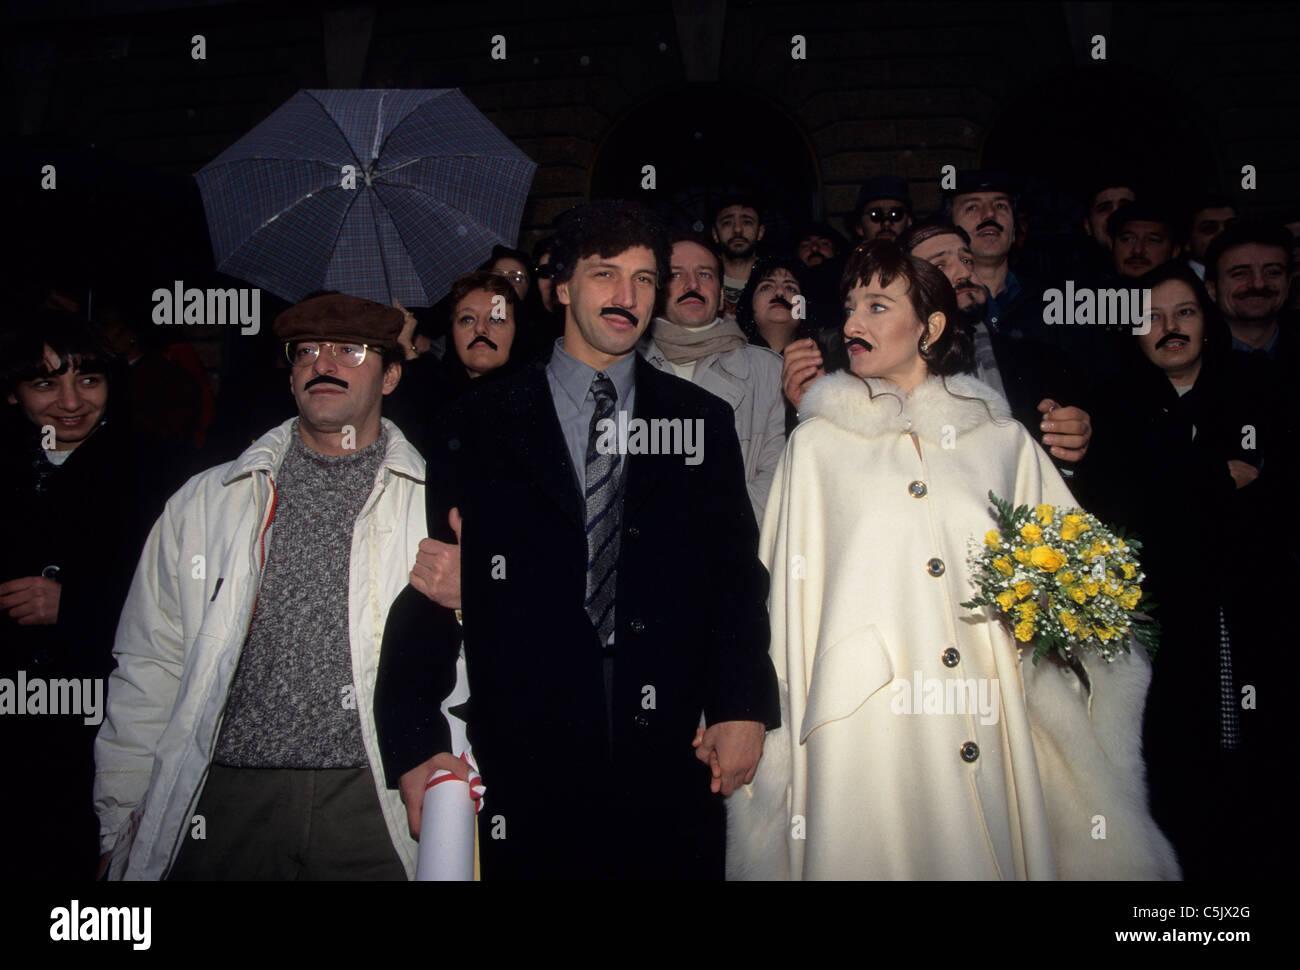 aldo giovanni and wife - Stock Image